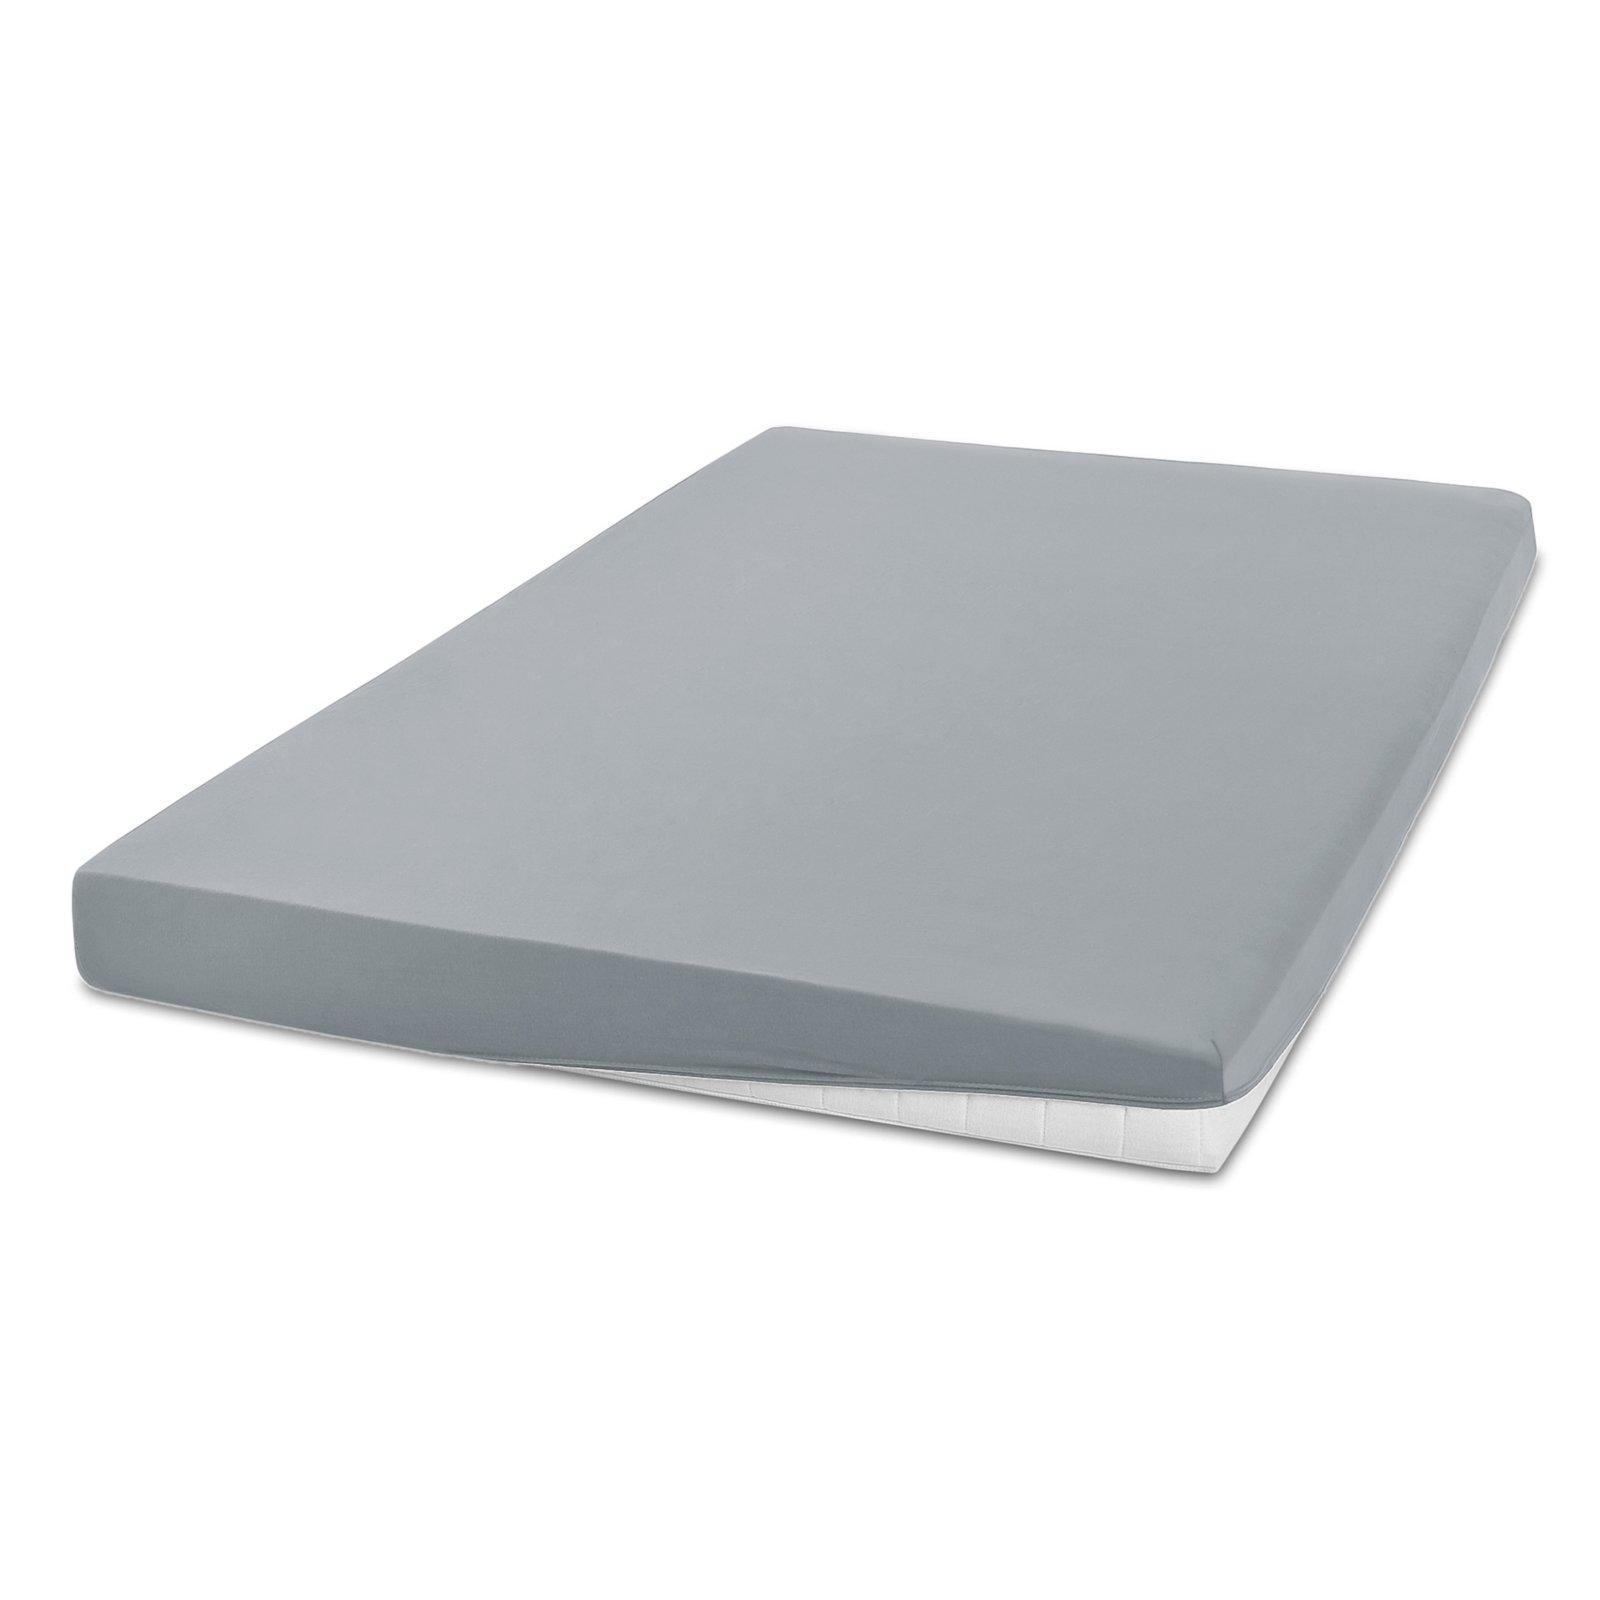 elastic jersey spannbettlaken exclusiv silber 140x200 cm bettlaken bettw sche. Black Bedroom Furniture Sets. Home Design Ideas